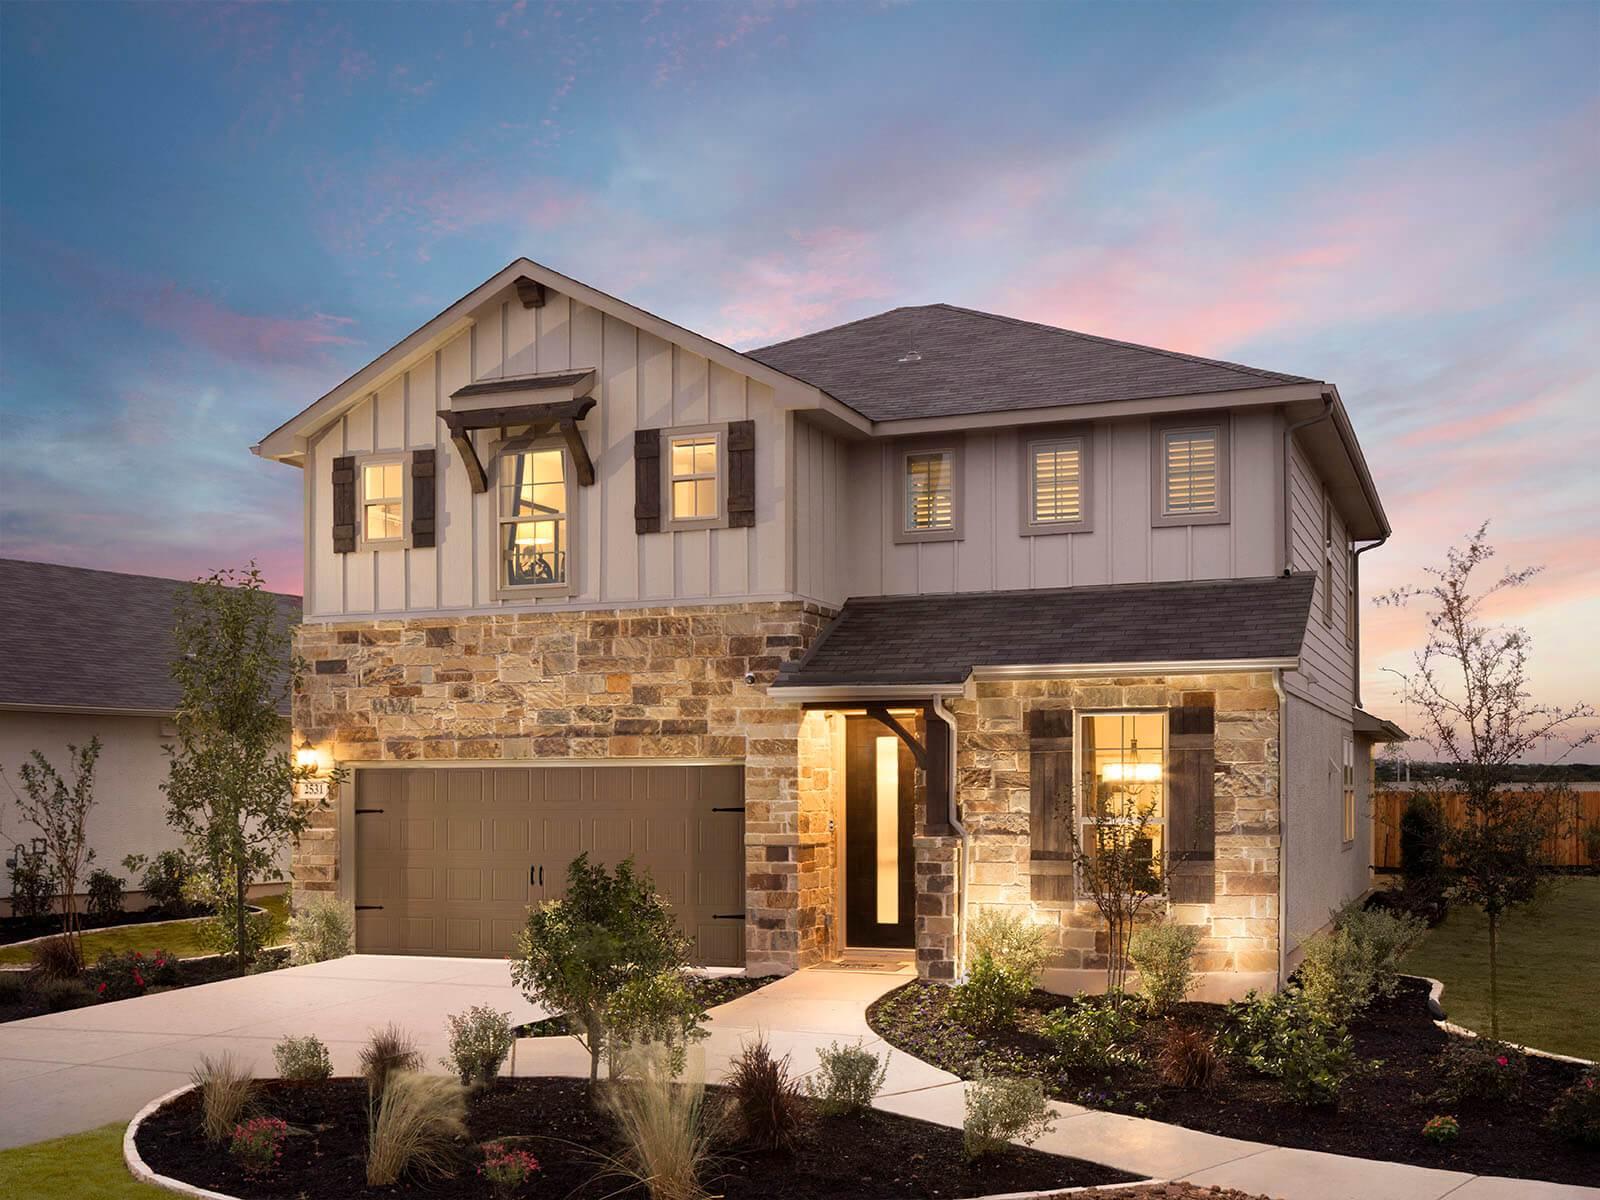 The Lavaca - Stunning stone exterior